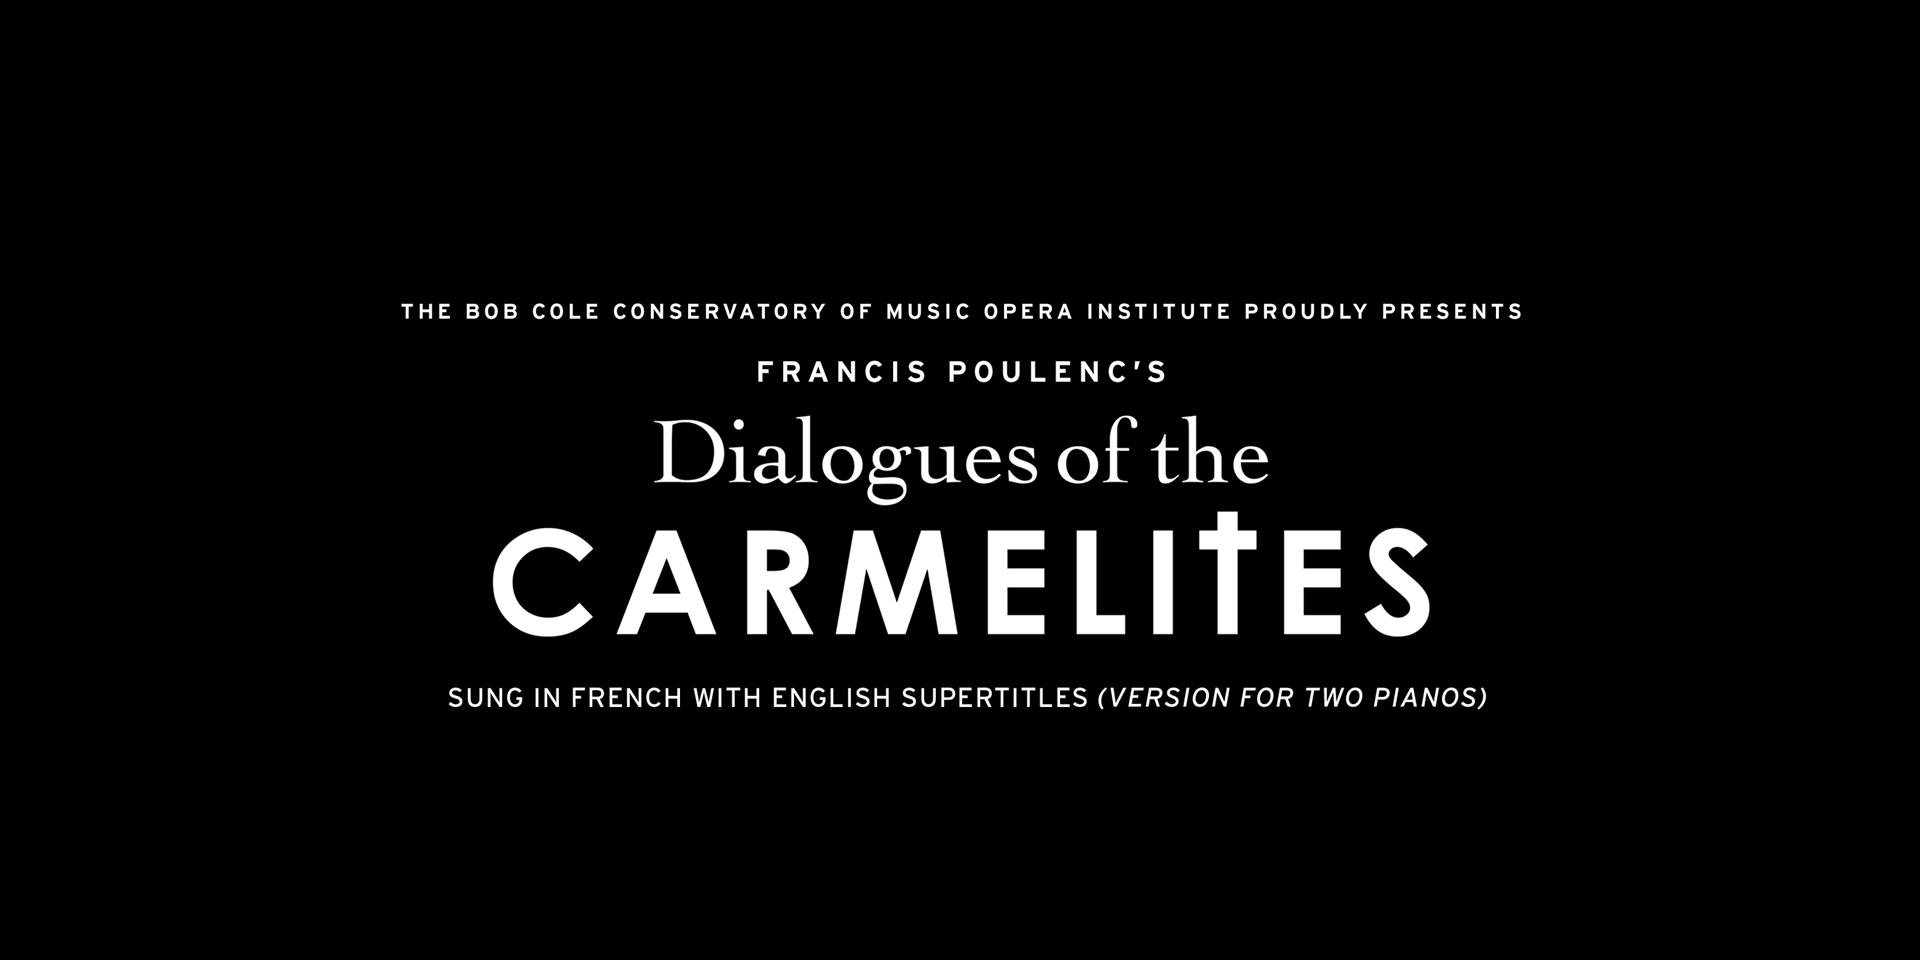 BCCM-CSULB | Opera: Dialogues of the Carmelites